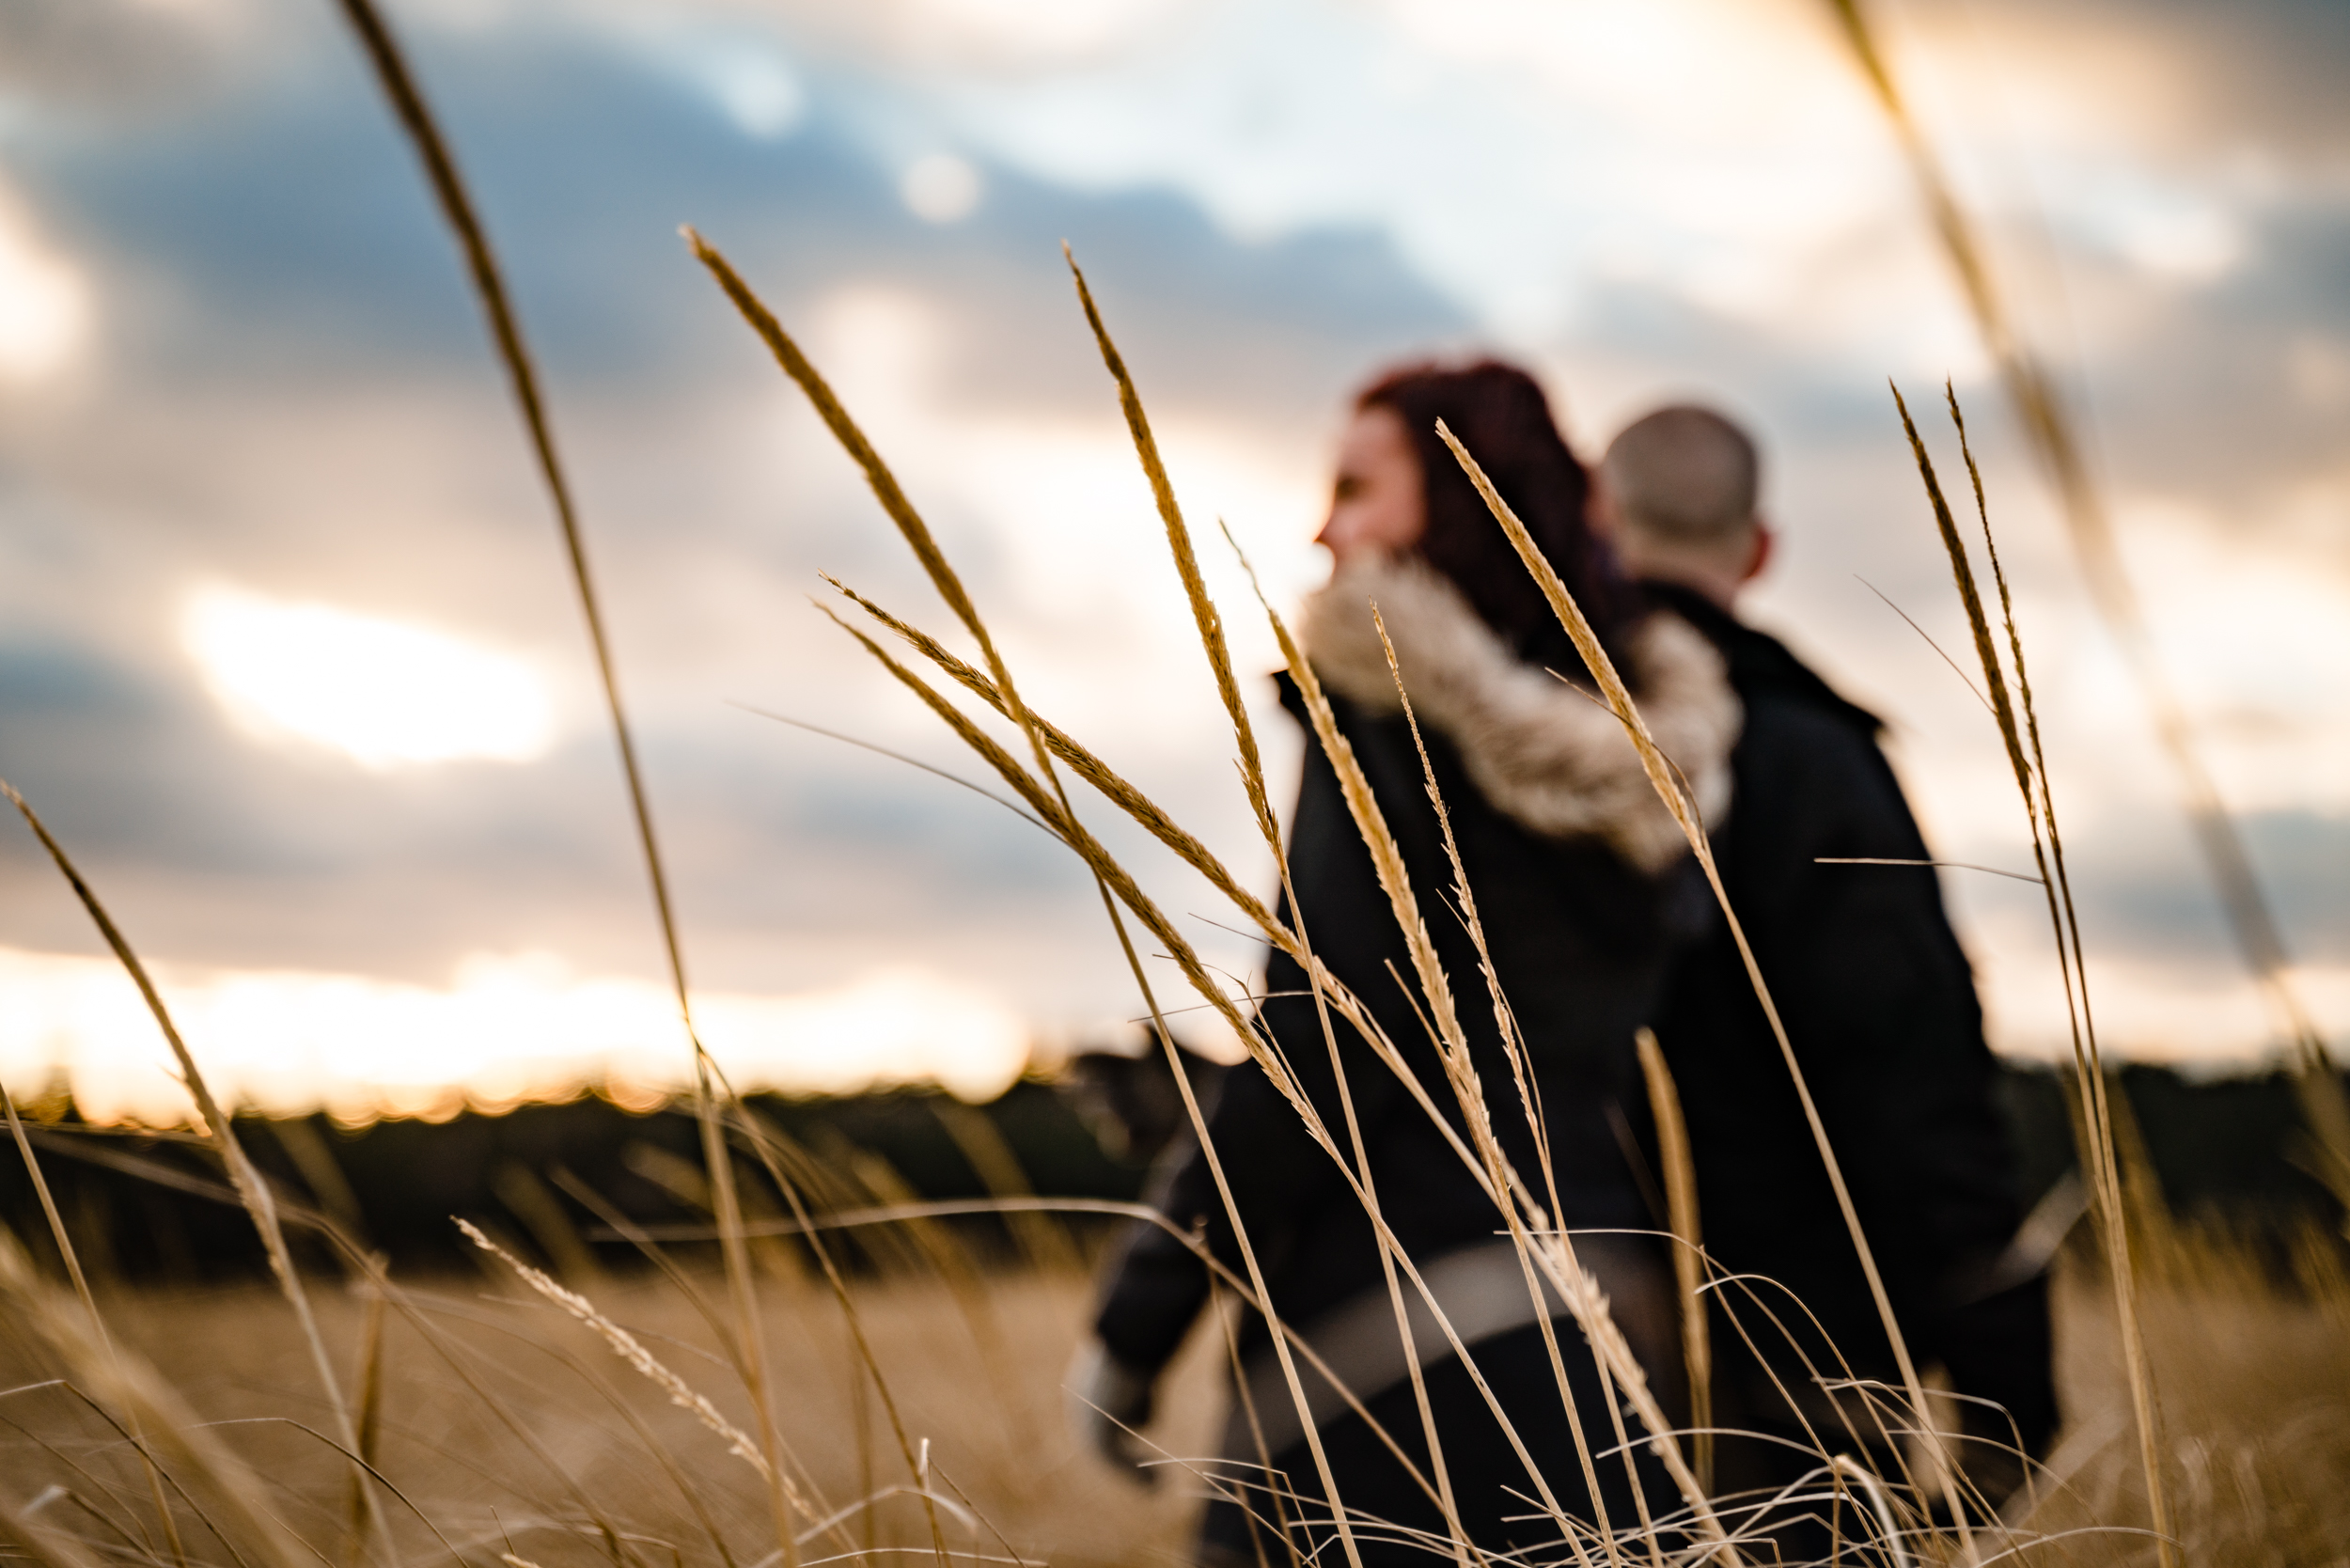 Sarah&Shayne-Halifax-engagement-weddingphotography-weddingphotographers-novascotia (25 of 41).jpg